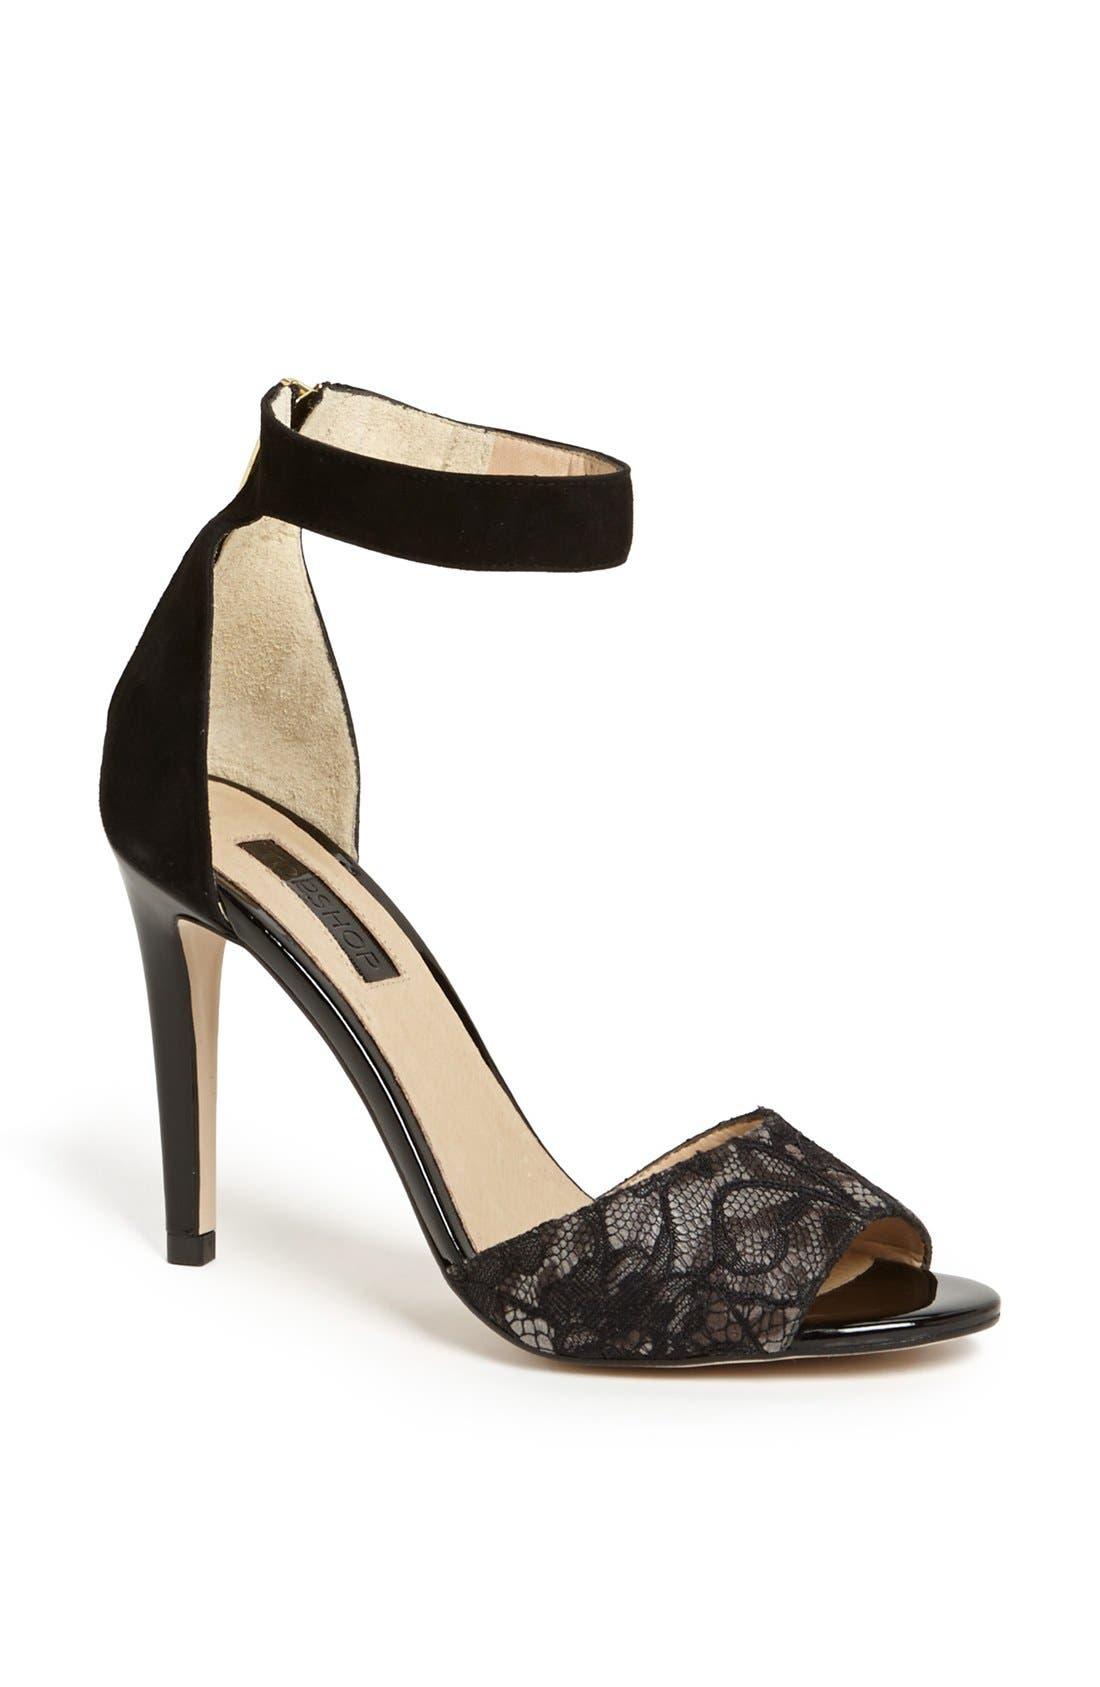 Main Image - Topshop 'Rees' Sandal